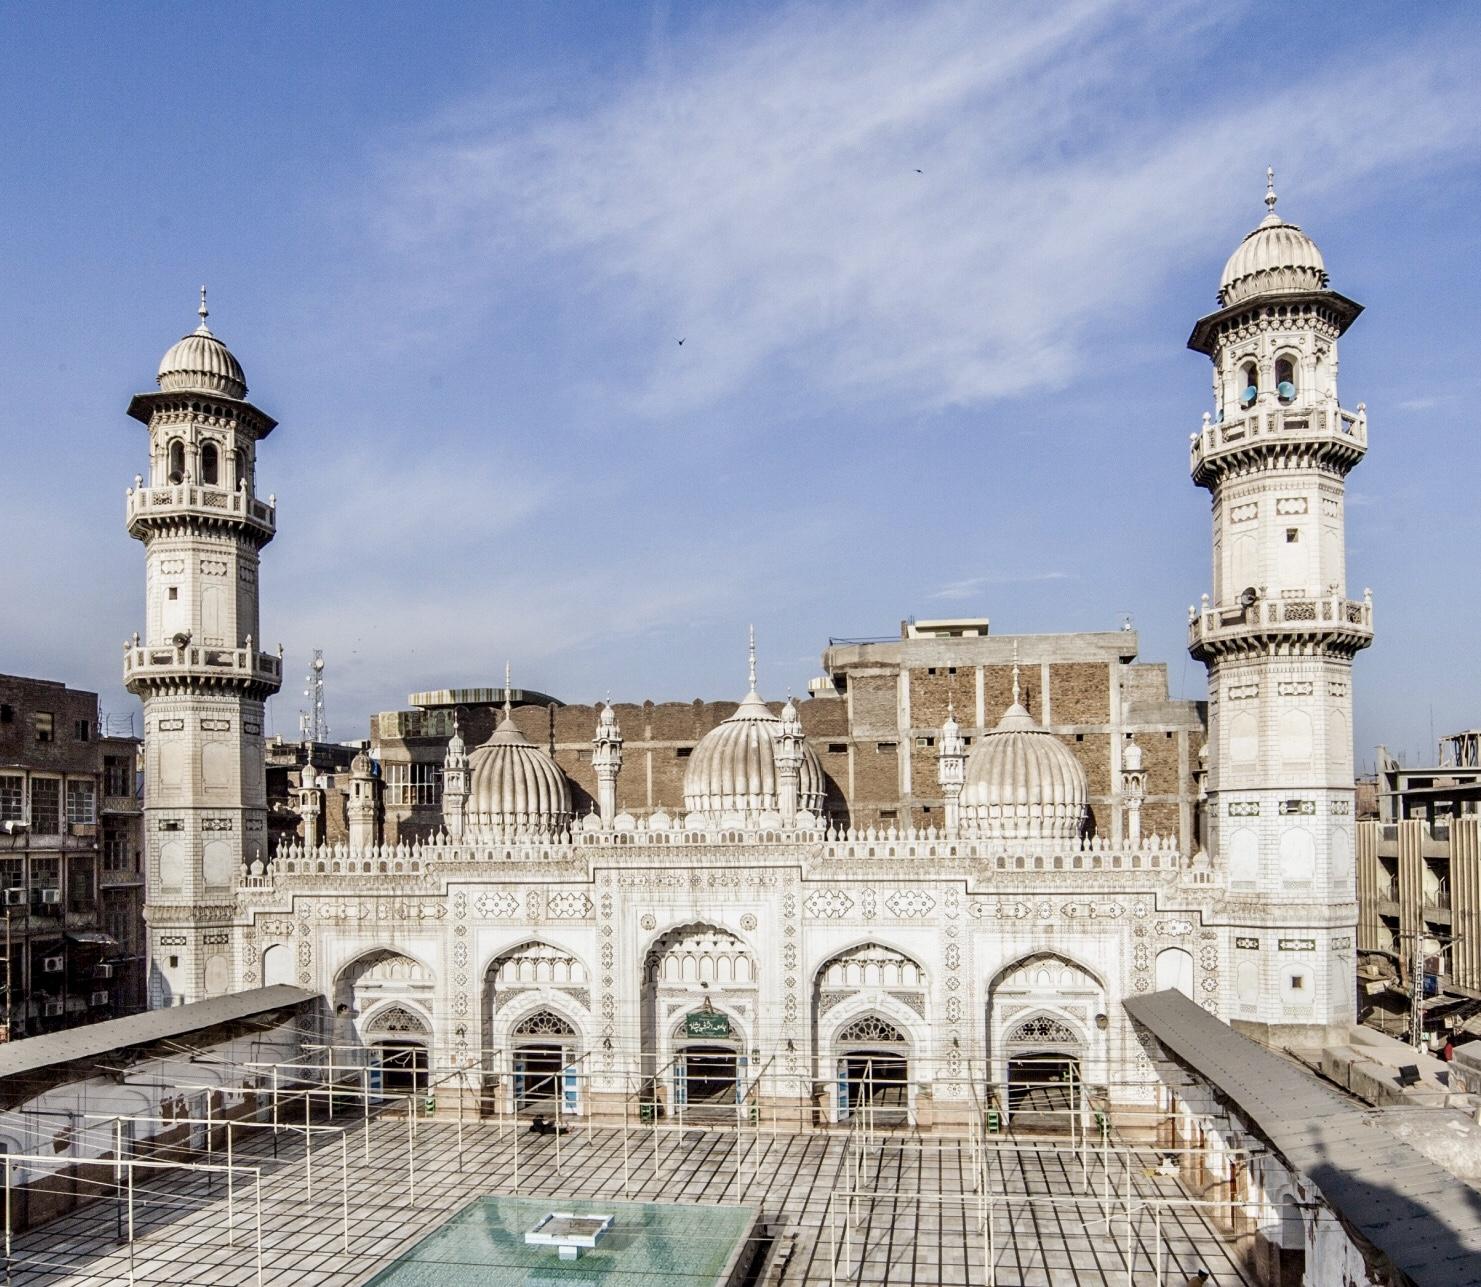 Mahabat Khan Mosque - Wikipedia